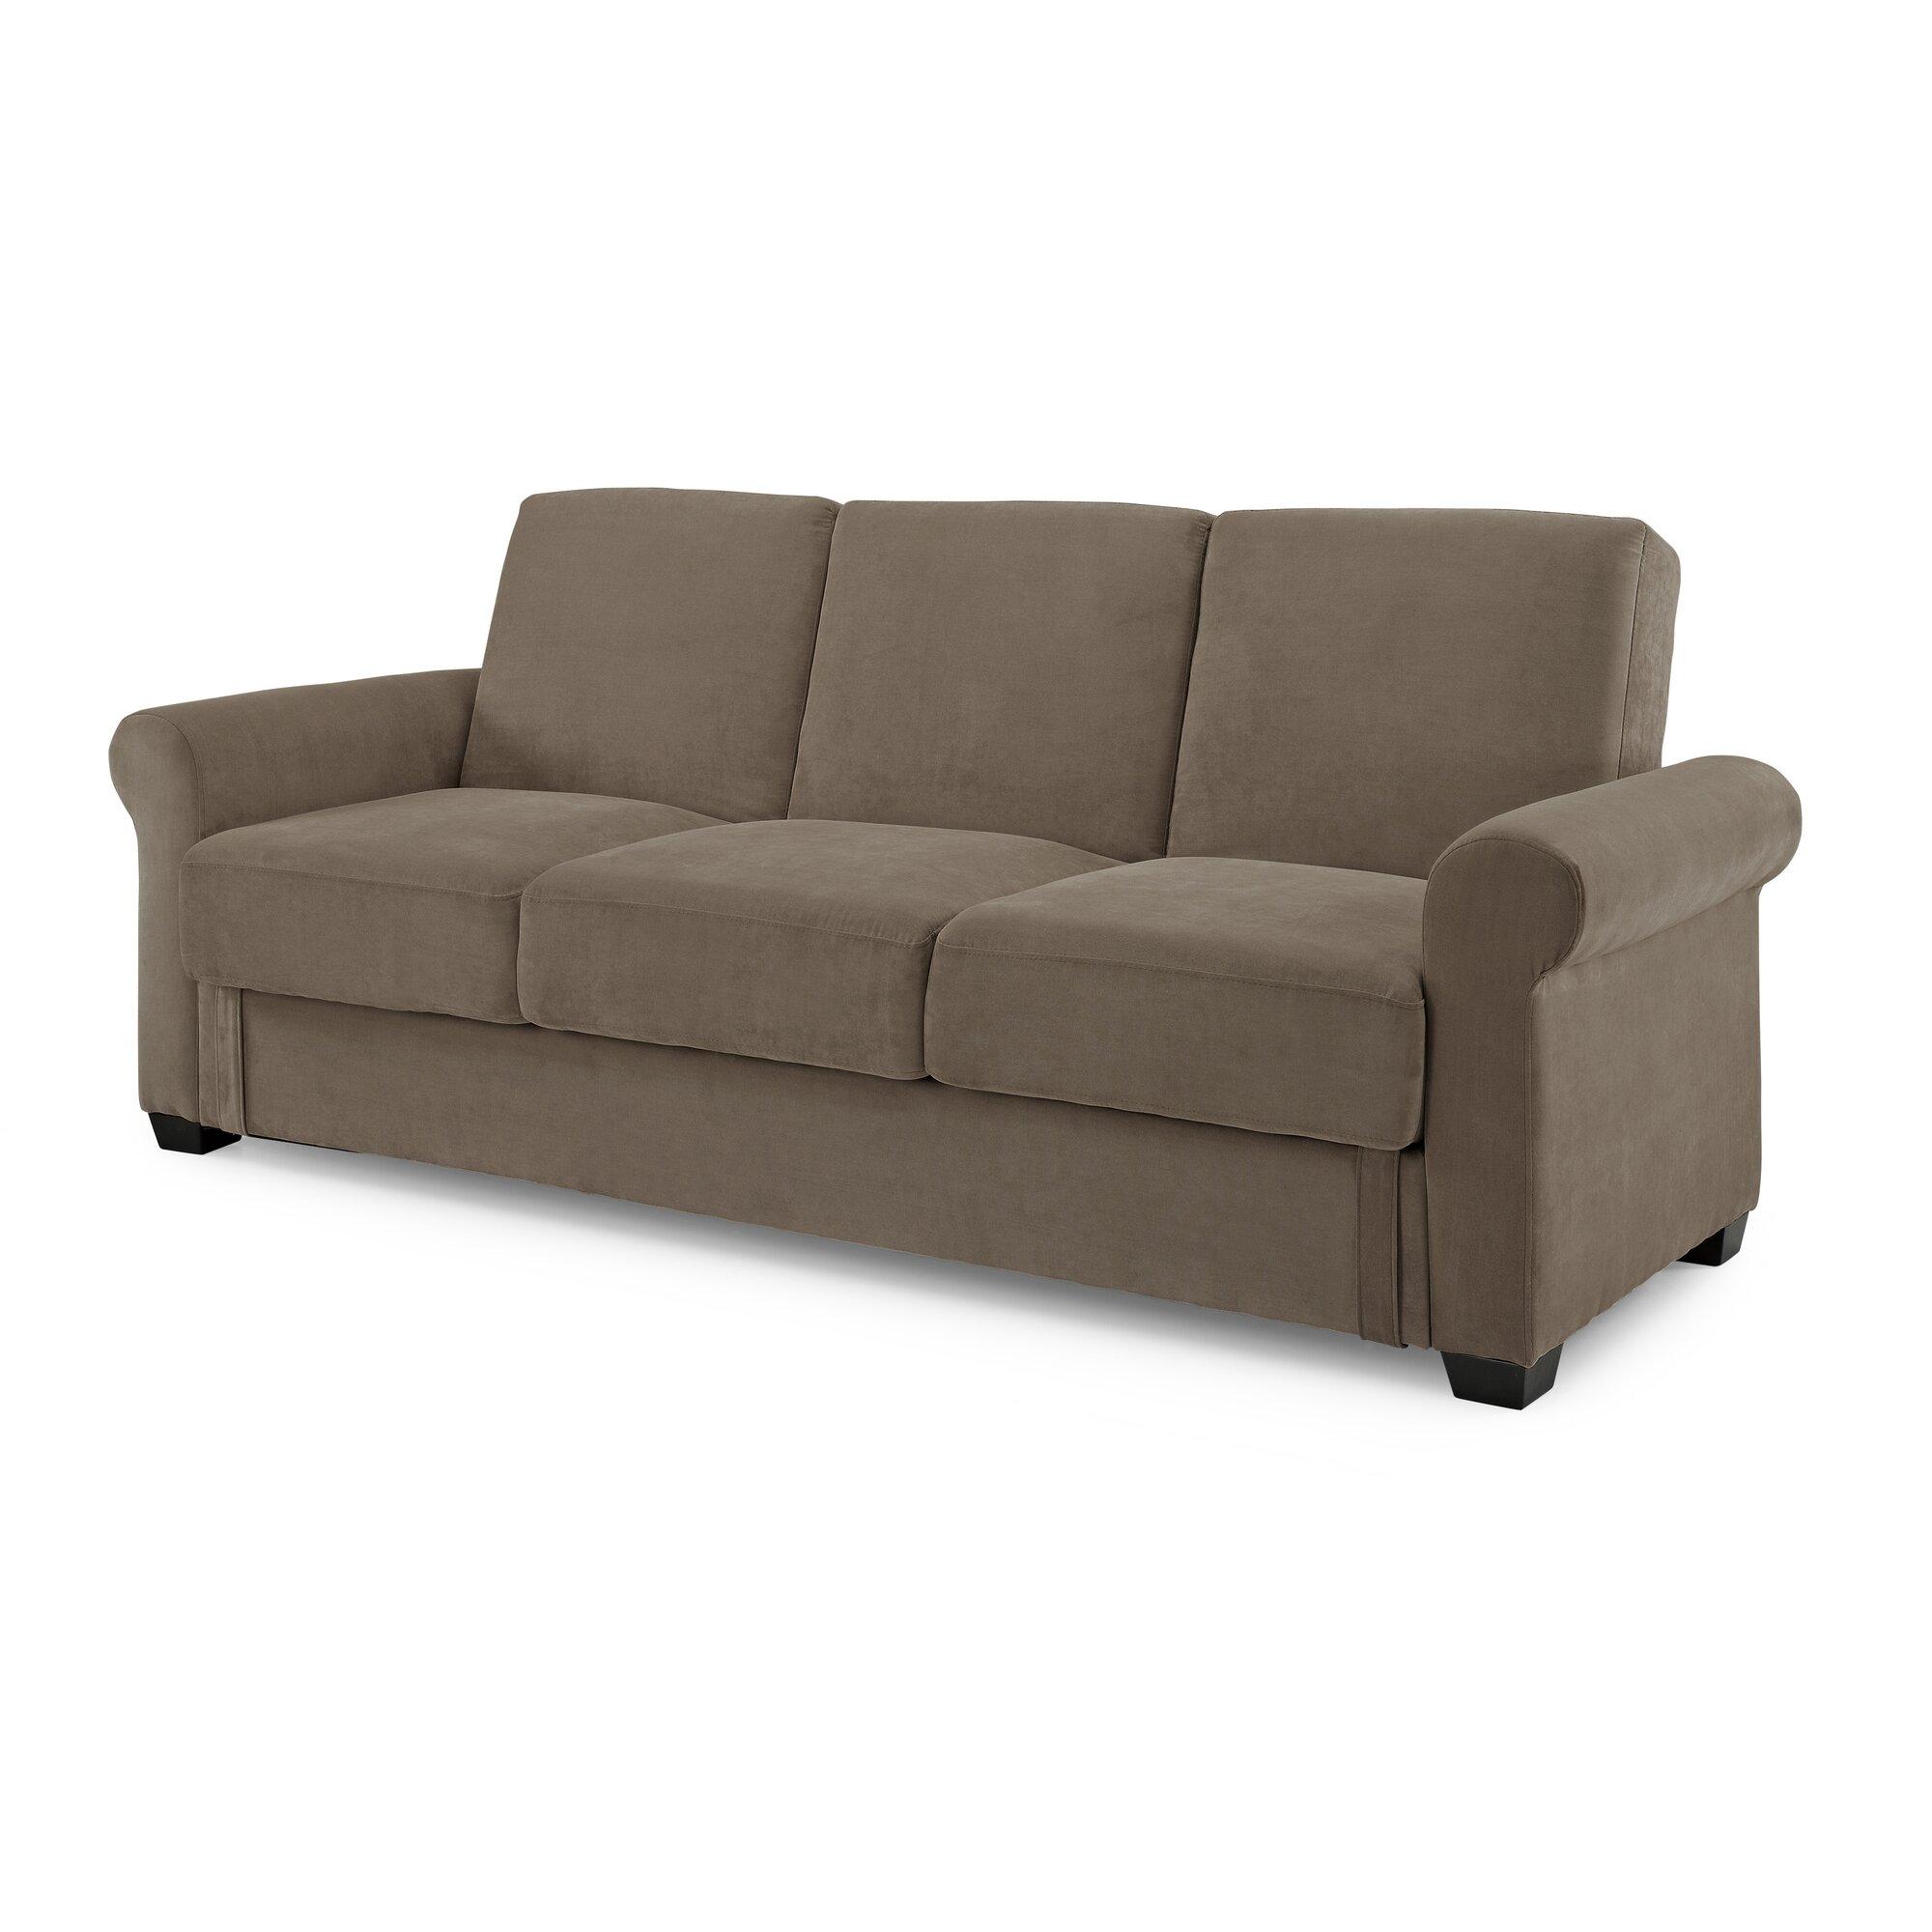 San Juan Click Clack Sofa With Cover Taupe Refil Sofa